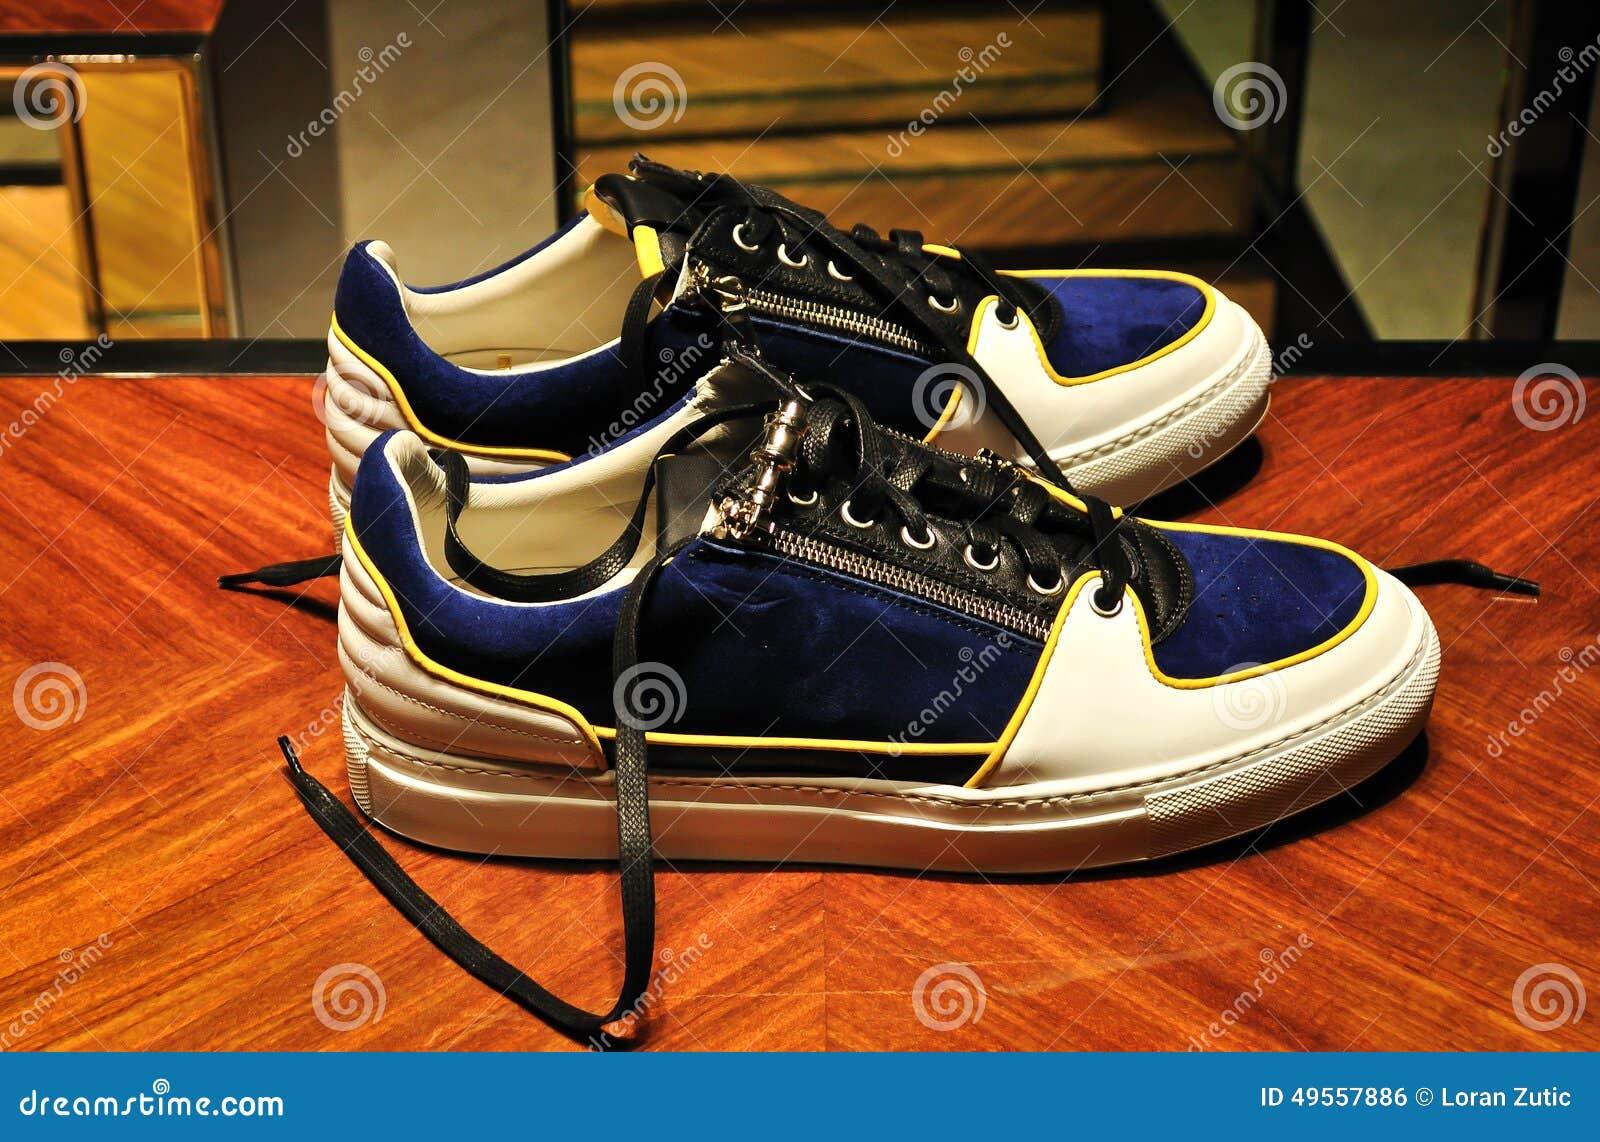 00d8cd9f4d5 Κομψά και περιστασιακά αθλητικά παπούτσια ατόμων Στοκ Εικόνες ...